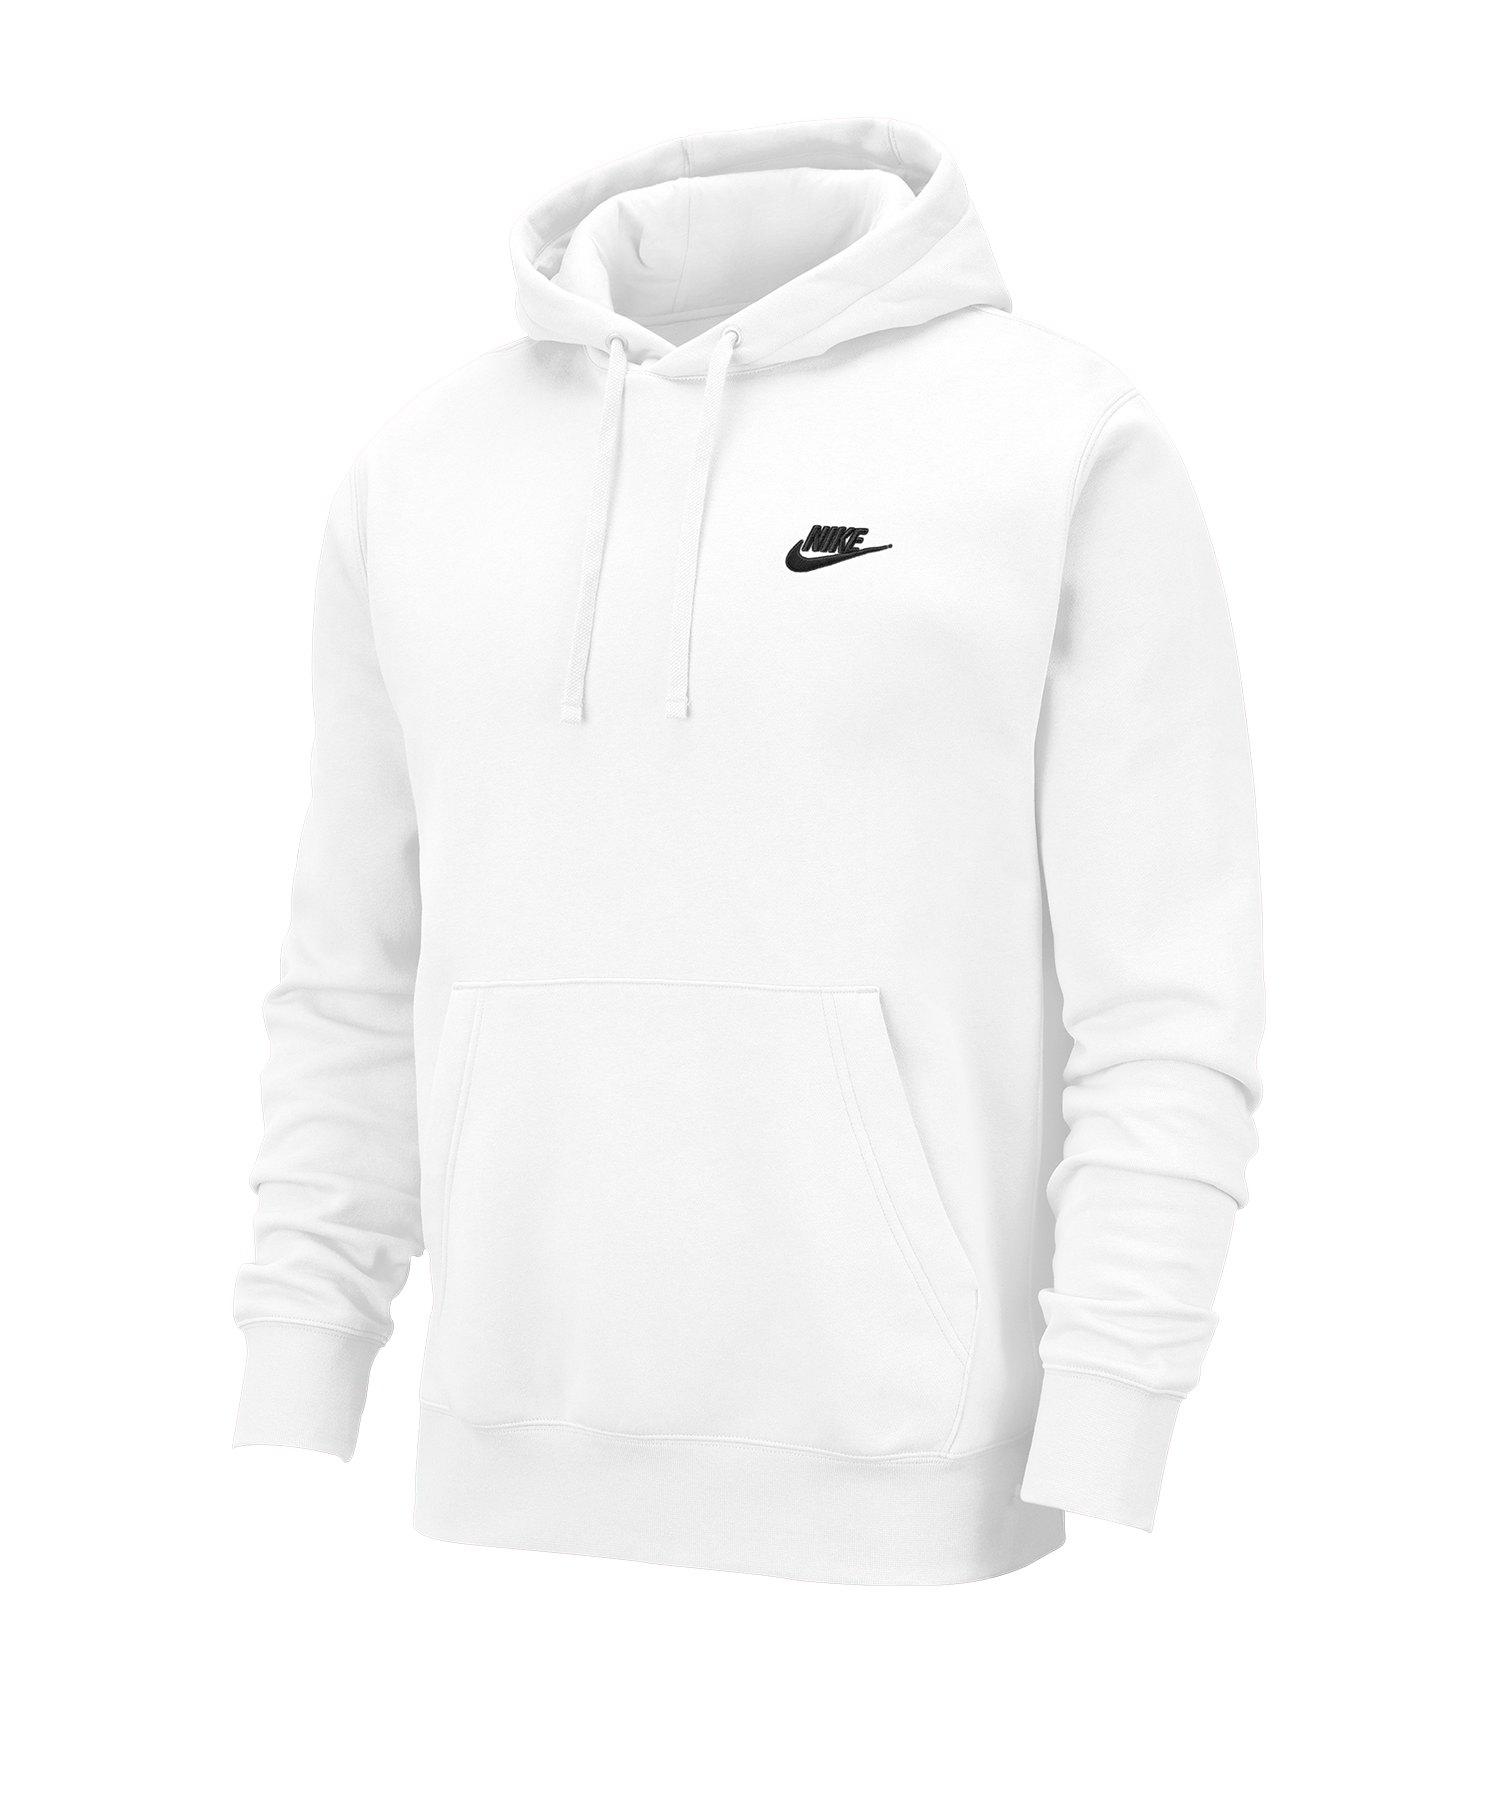 Nike Club Fleece Kapuzensweatshirt Weiss F100 - weiss